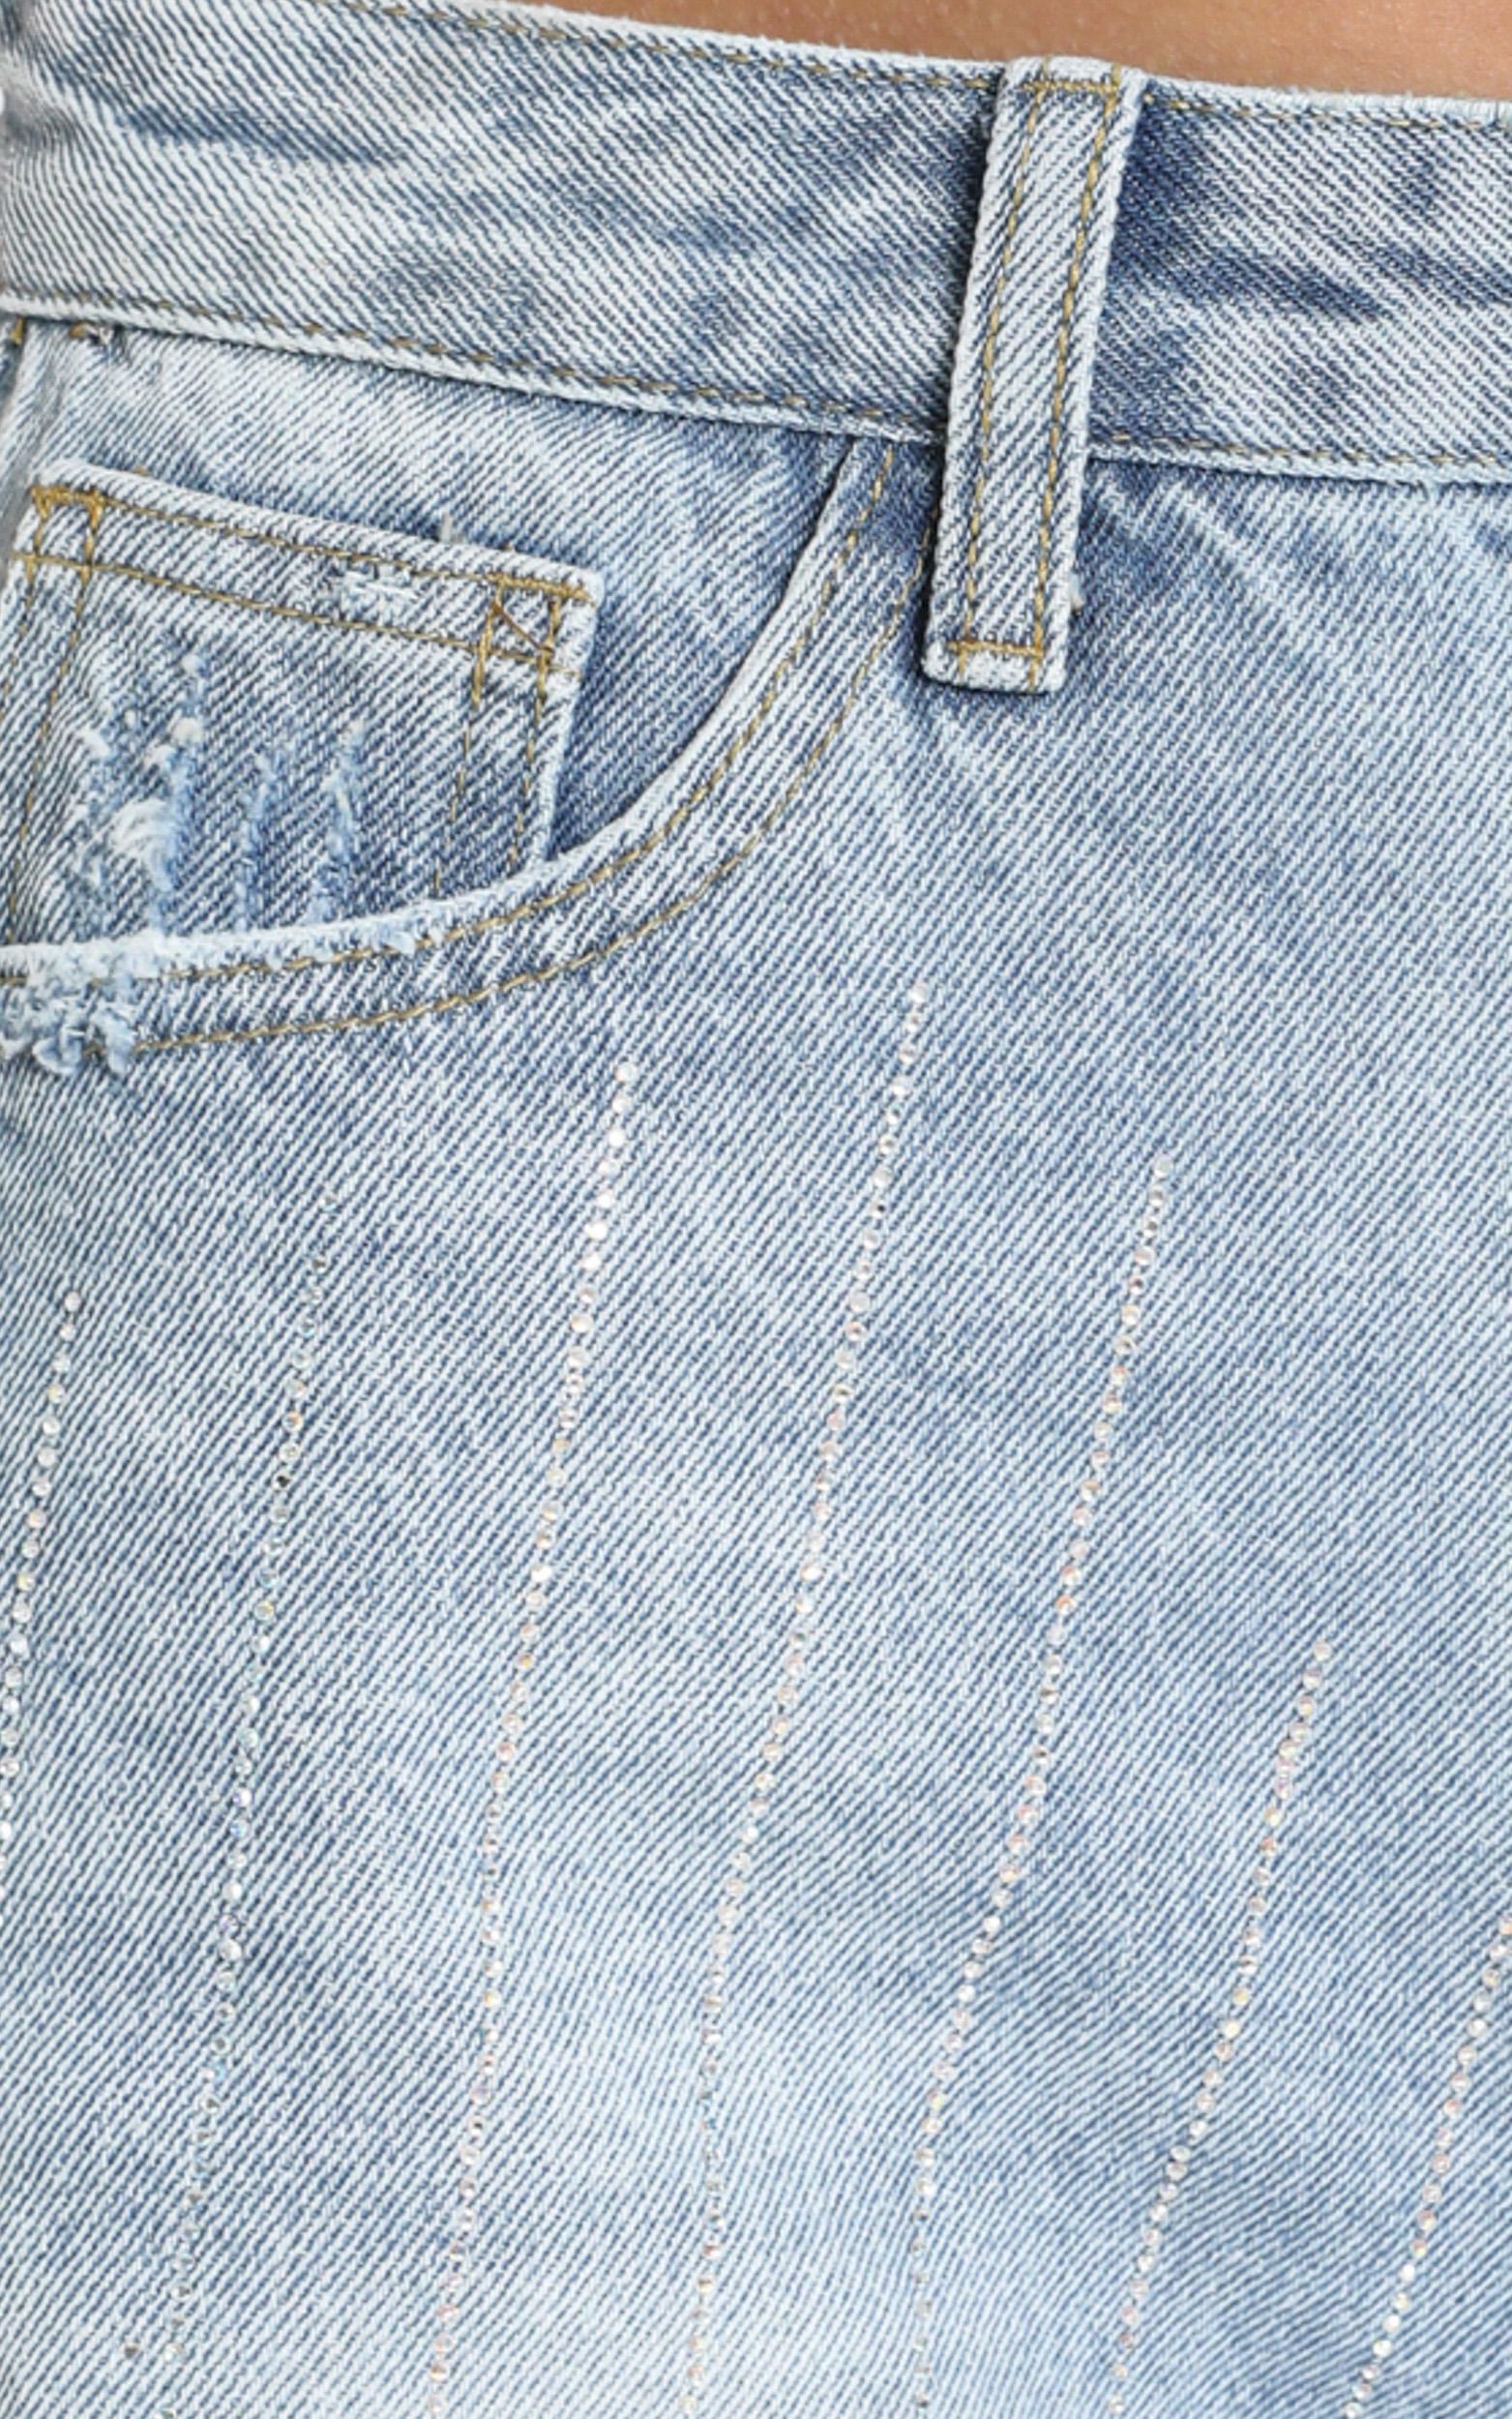 Crysanne Denim Shorts in light wash - 8 (S), Blue, hi-res image number null